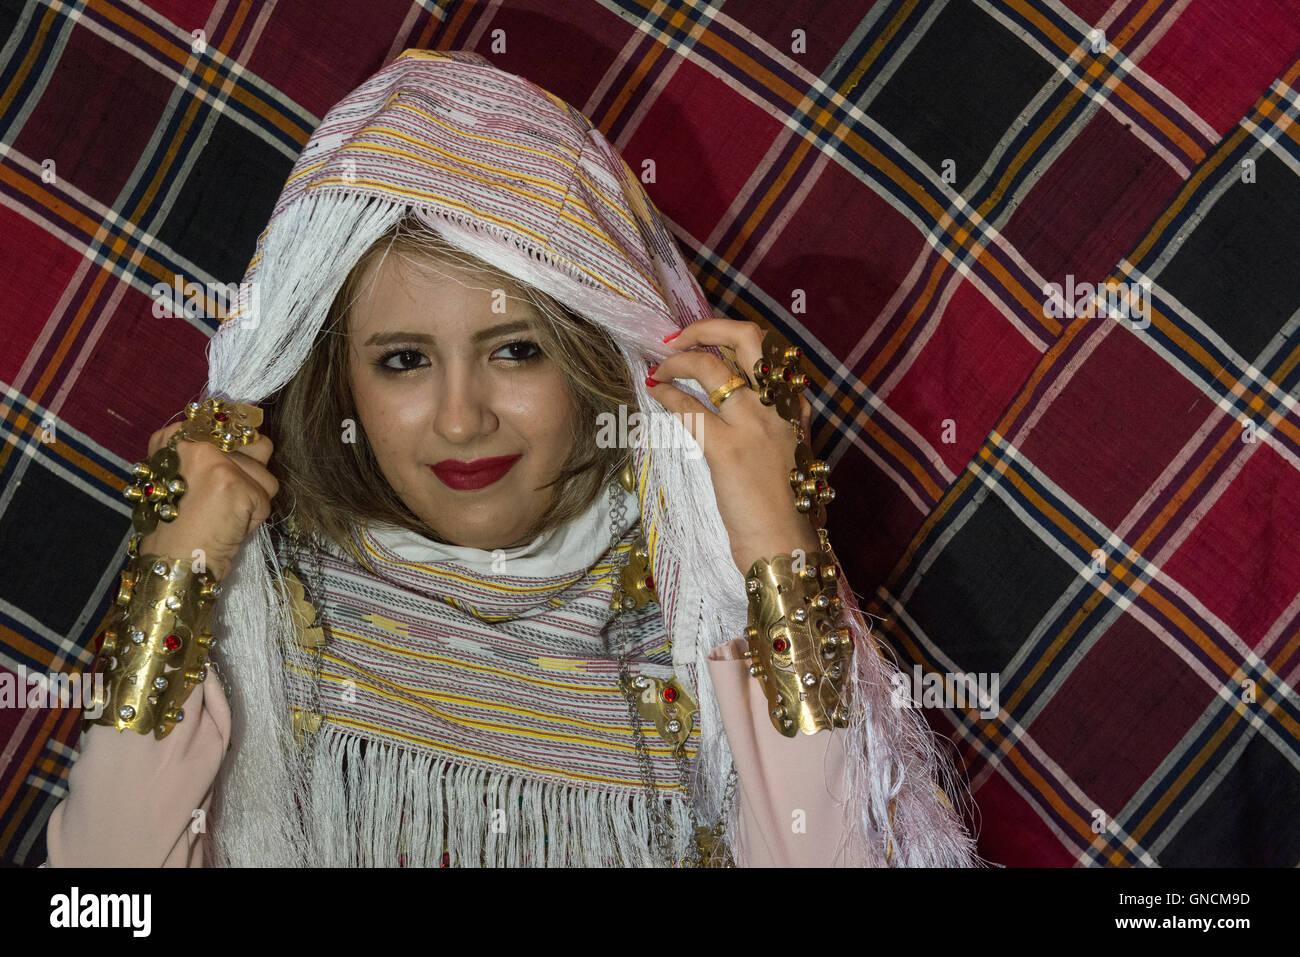 Bandar Torkaman, Turkmen Wedding, Bride Uncovering Traditional Veil - Stock Image